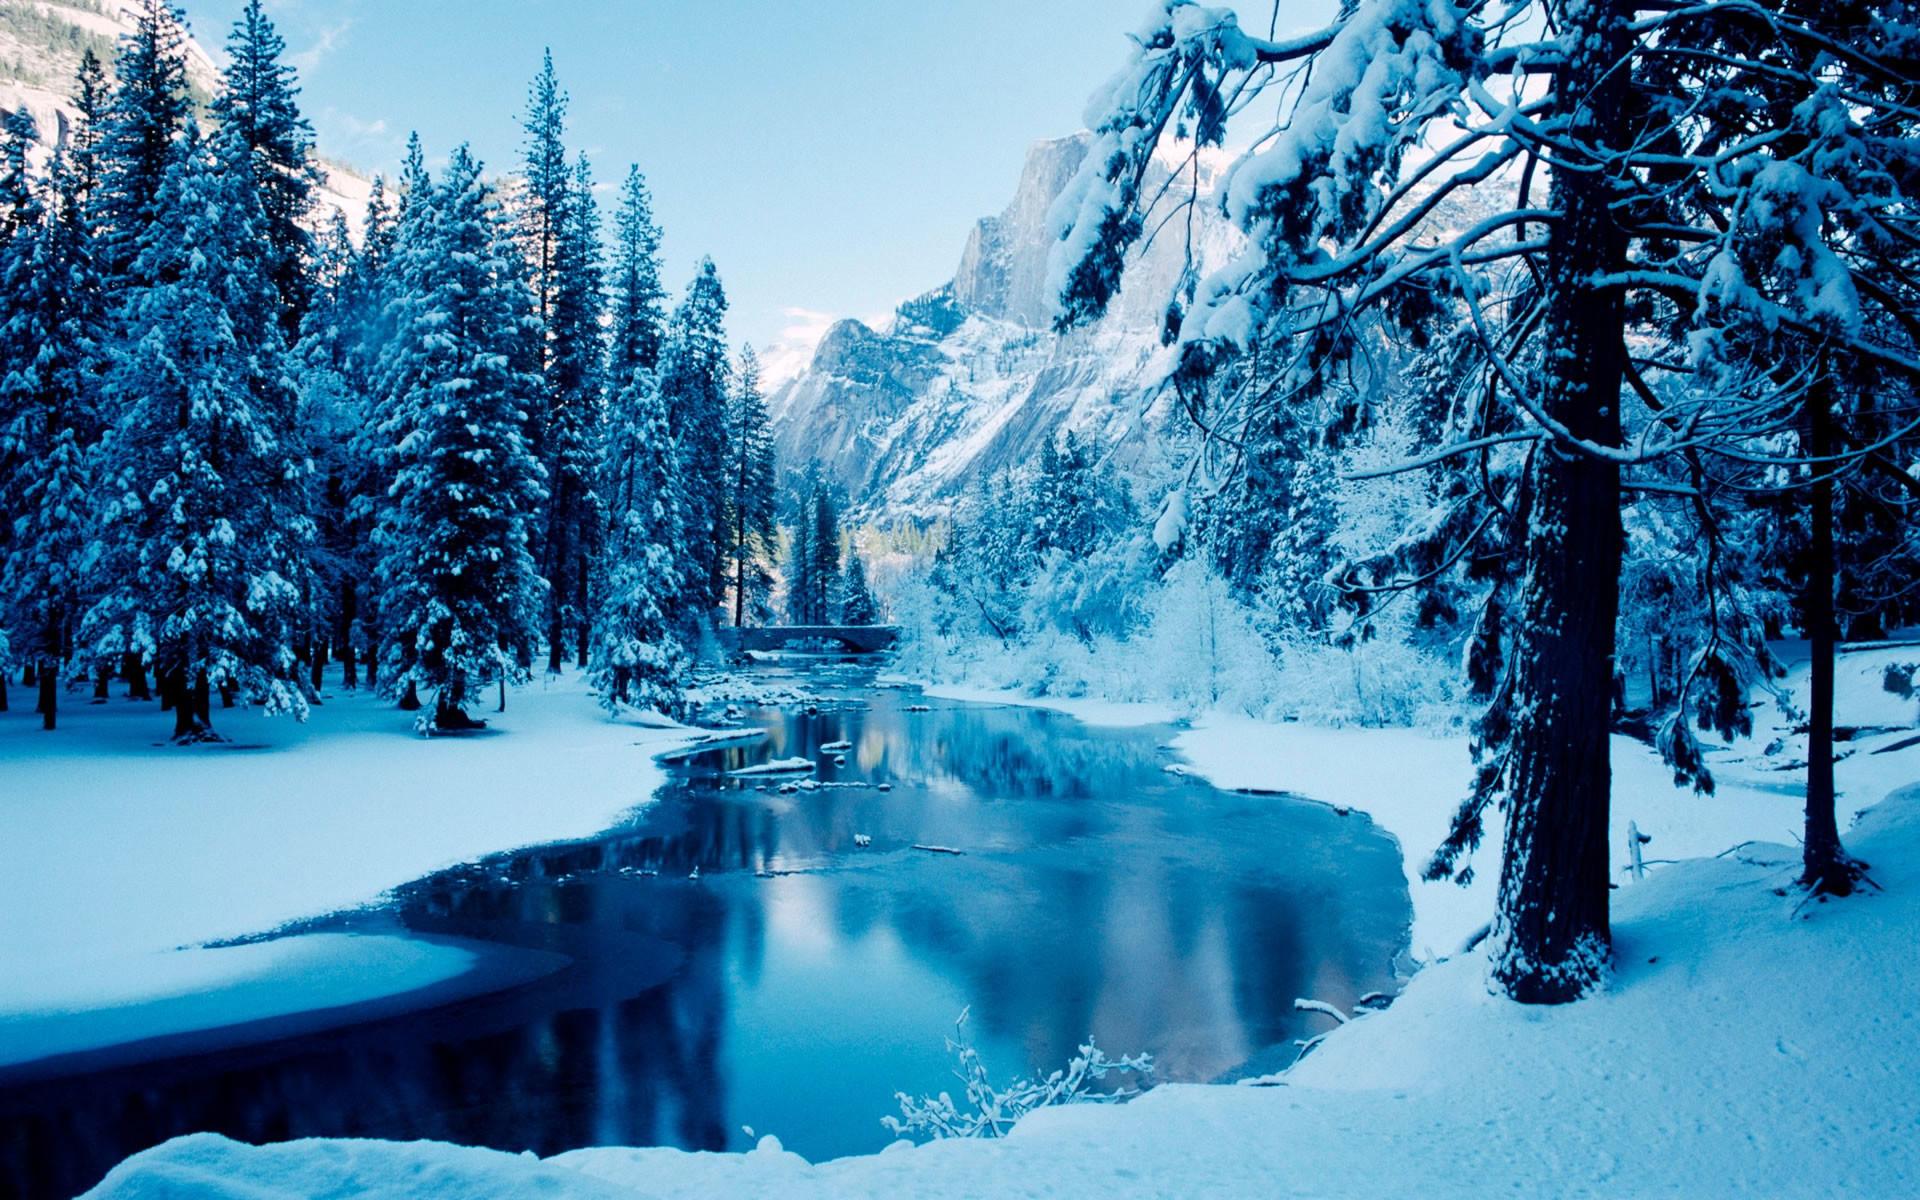 blue winter-the cold winter landscape Desktop Wallpapers View